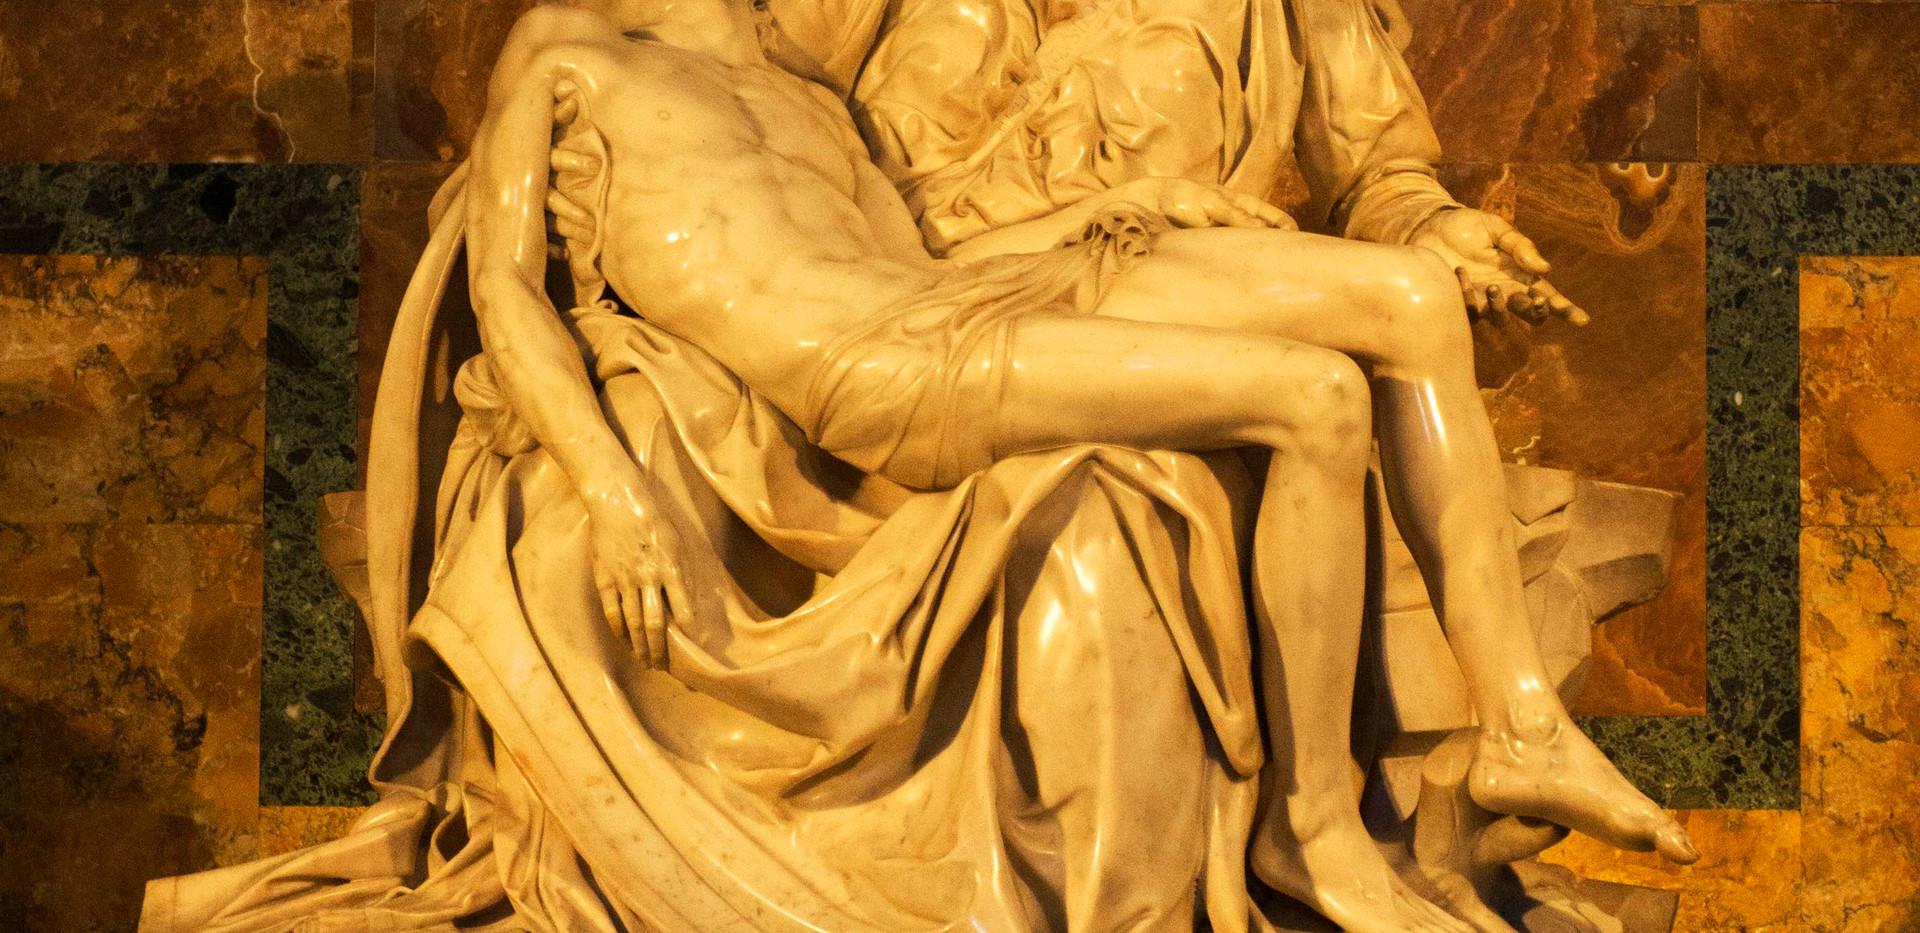 La Pieta by Micheangelo - St. Peter's